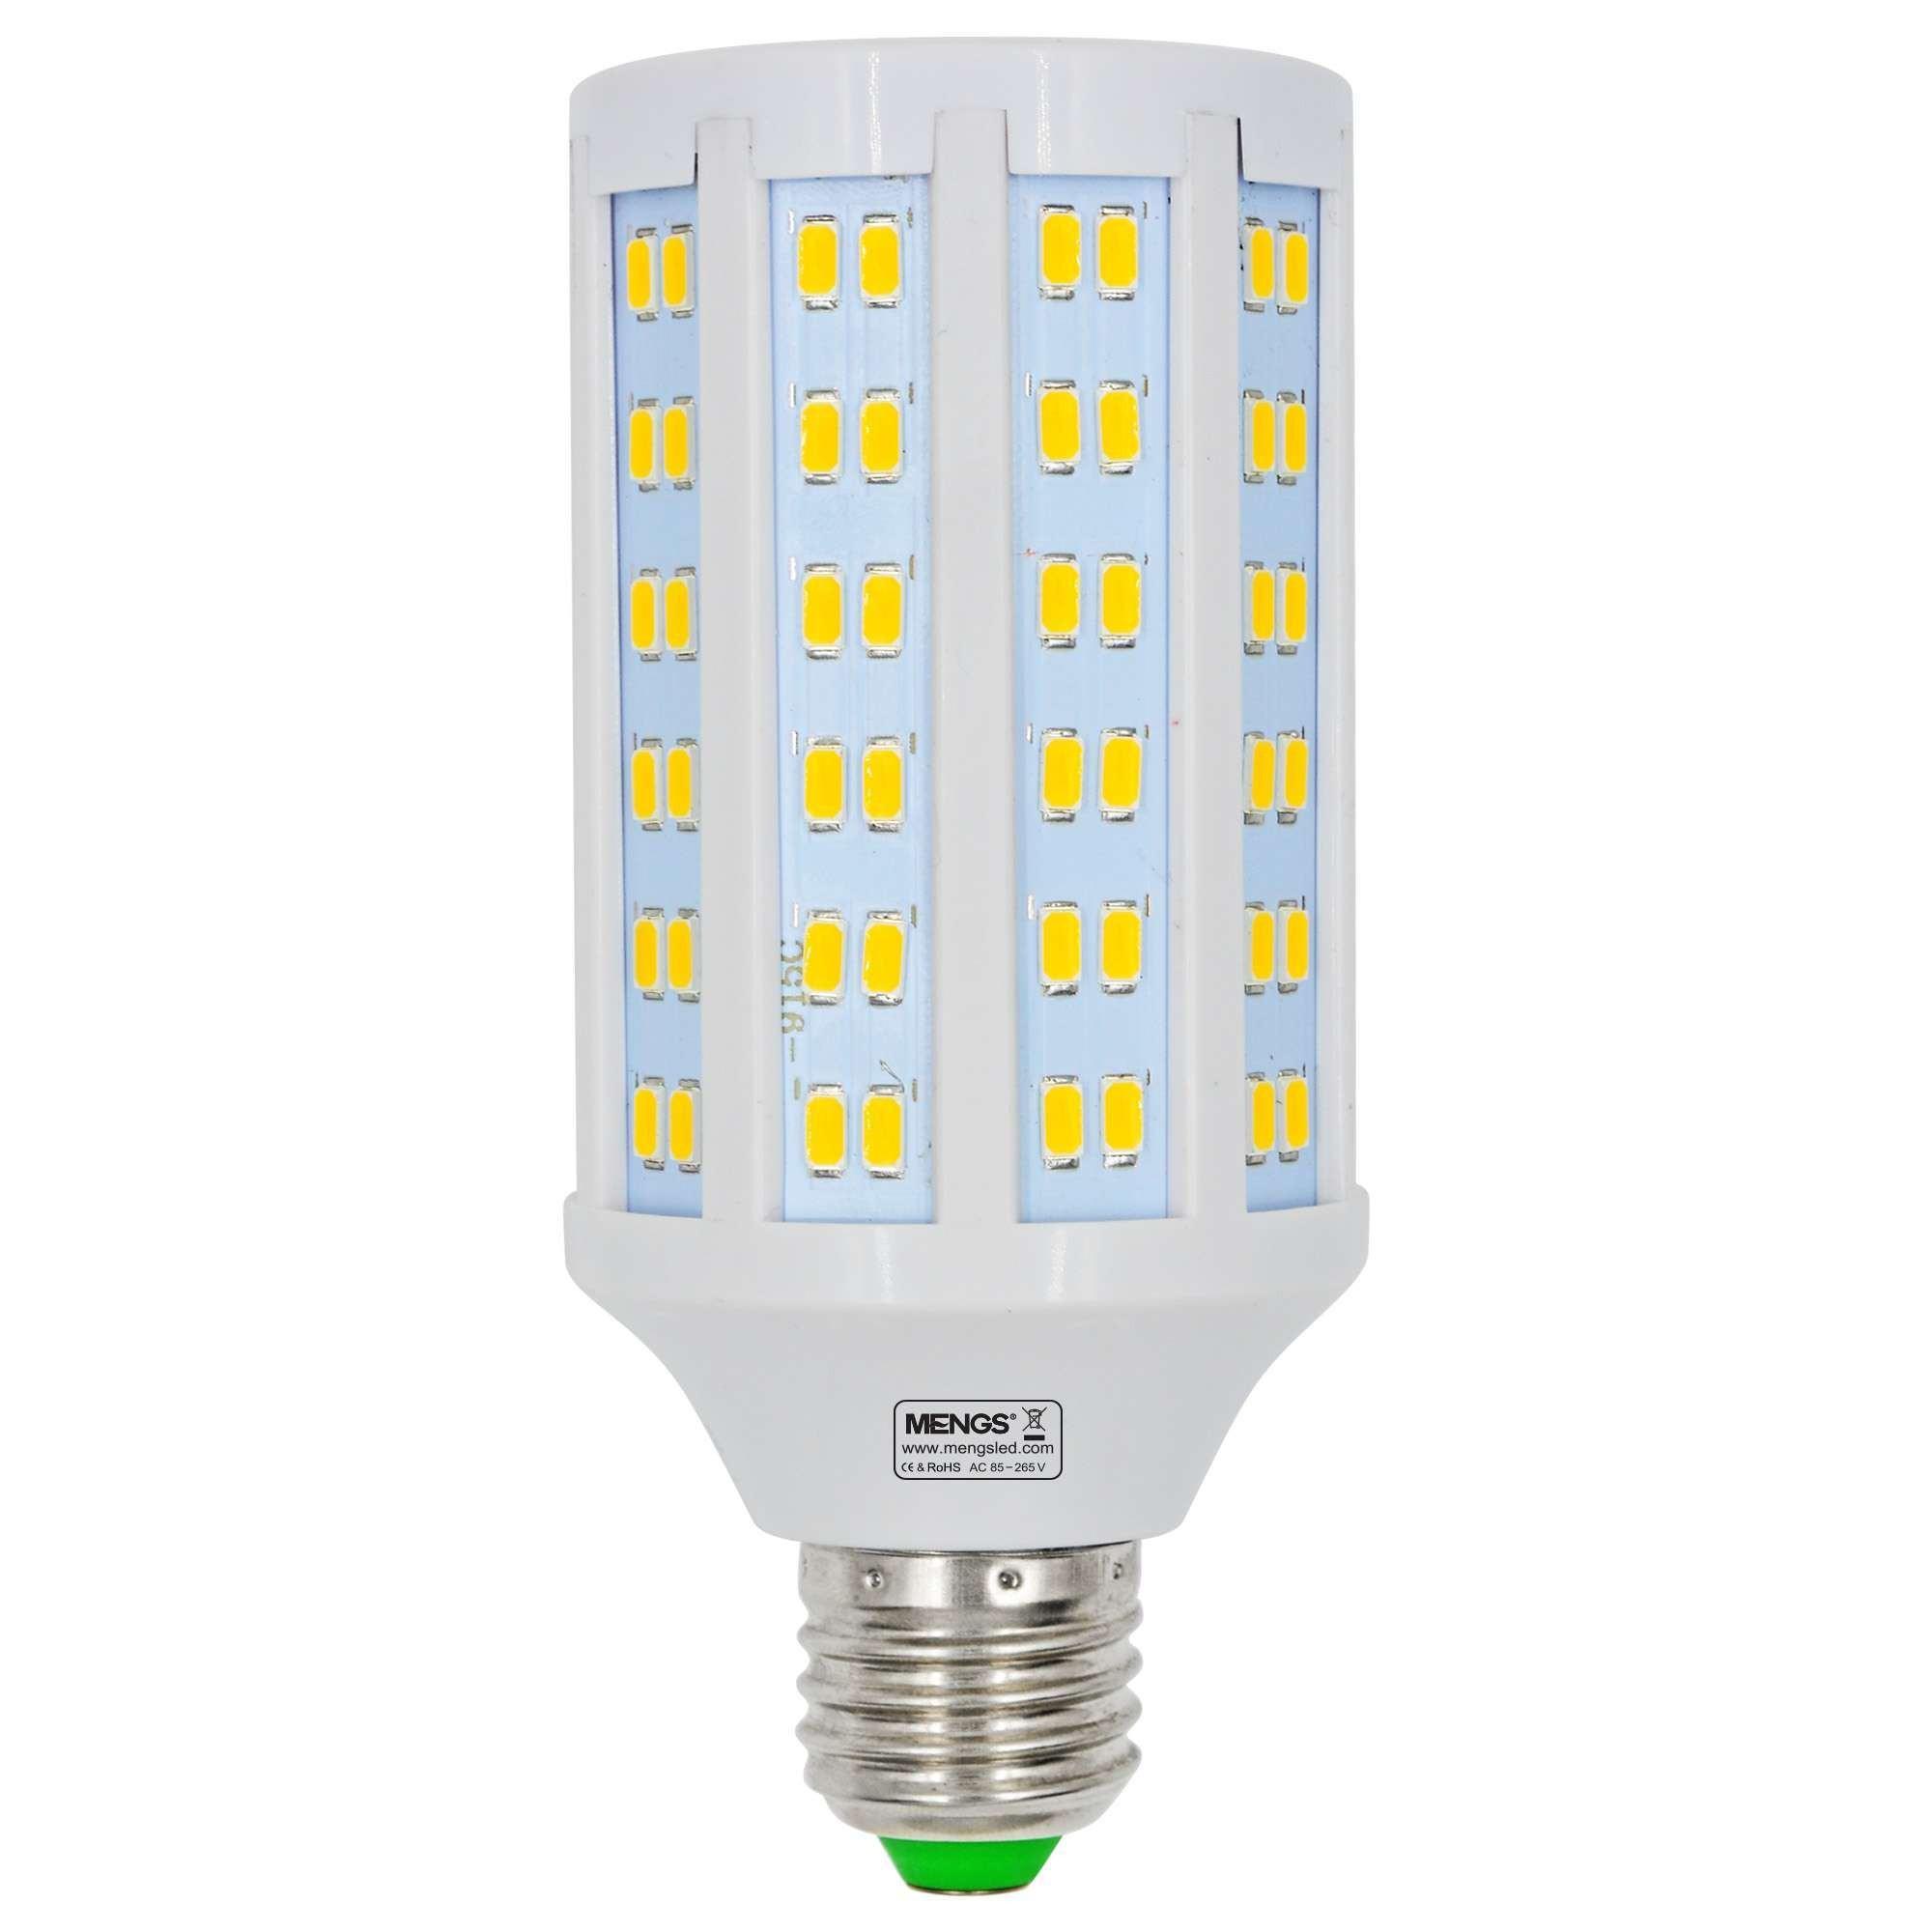 mengsled mengs e27 20w led corn light 144x 5730 smd led bulb lamp ac 85 265v in warm white. Black Bedroom Furniture Sets. Home Design Ideas